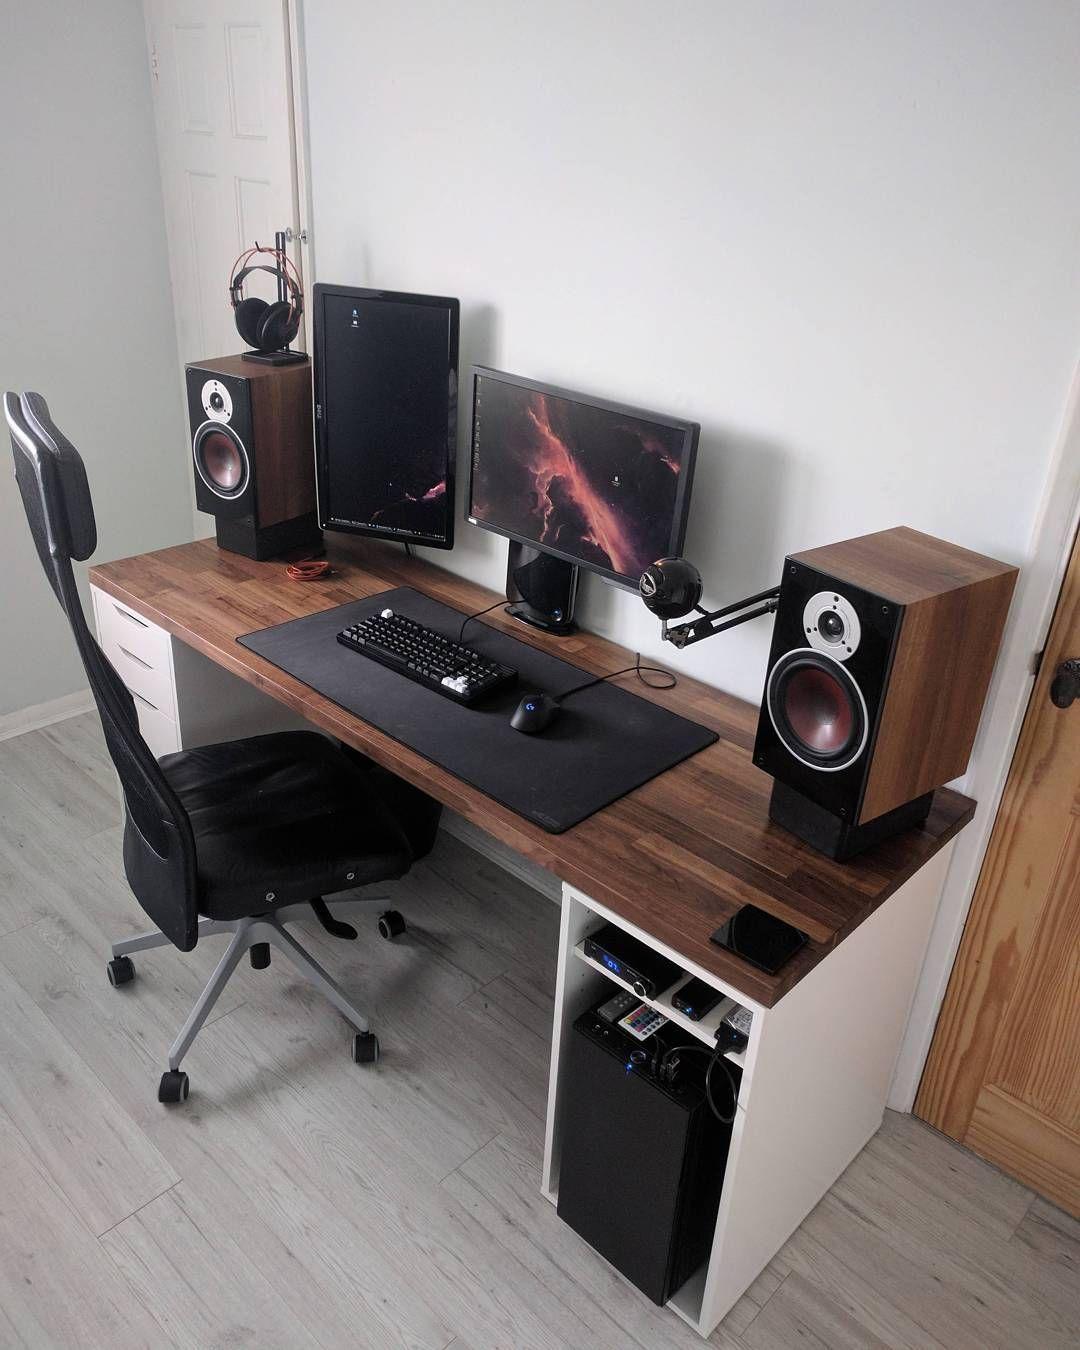 15 stunning diy corner desk designs to inspire you diy corner desk rh pinterest com